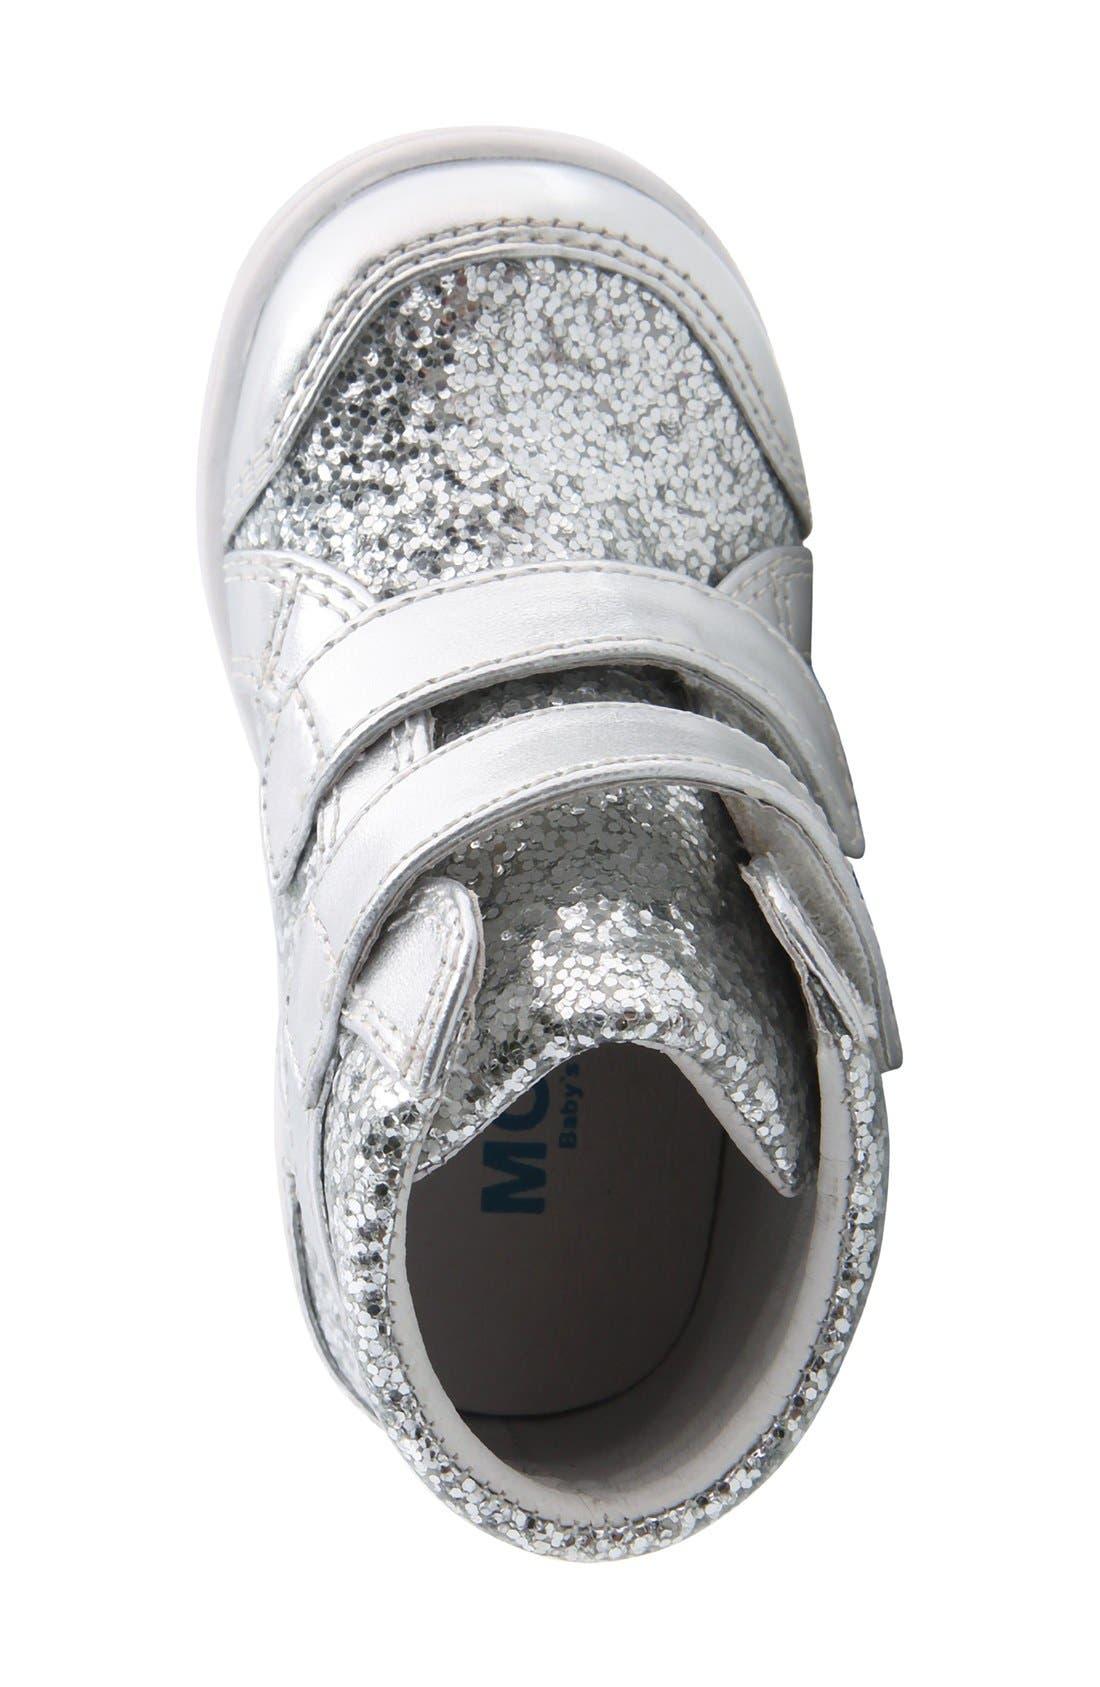 Nina 'Stardust' Metallic High Top Sneaker,                             Alternate thumbnail 2, color,                             047